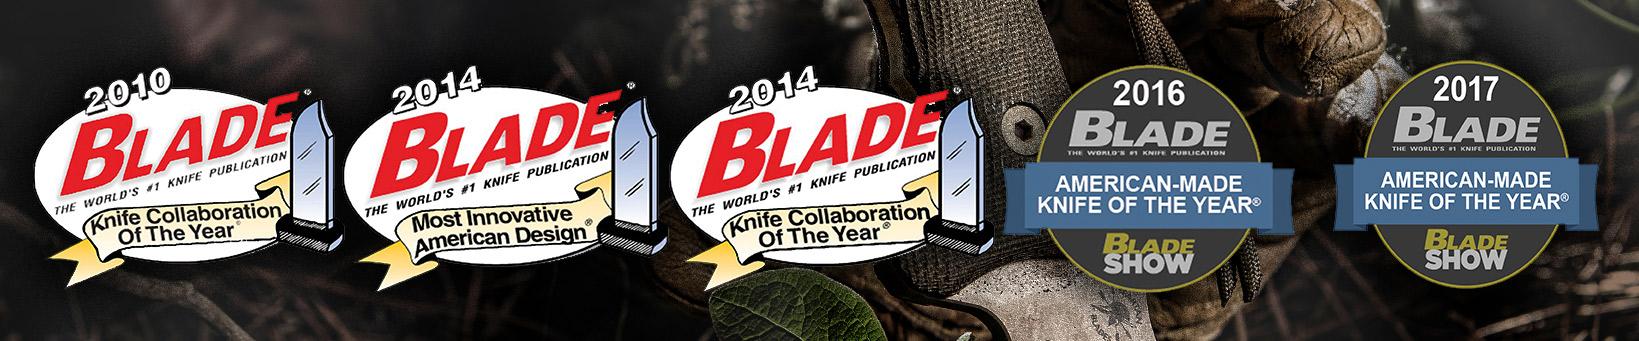 spartan-blades-blade-show-awards.jpg